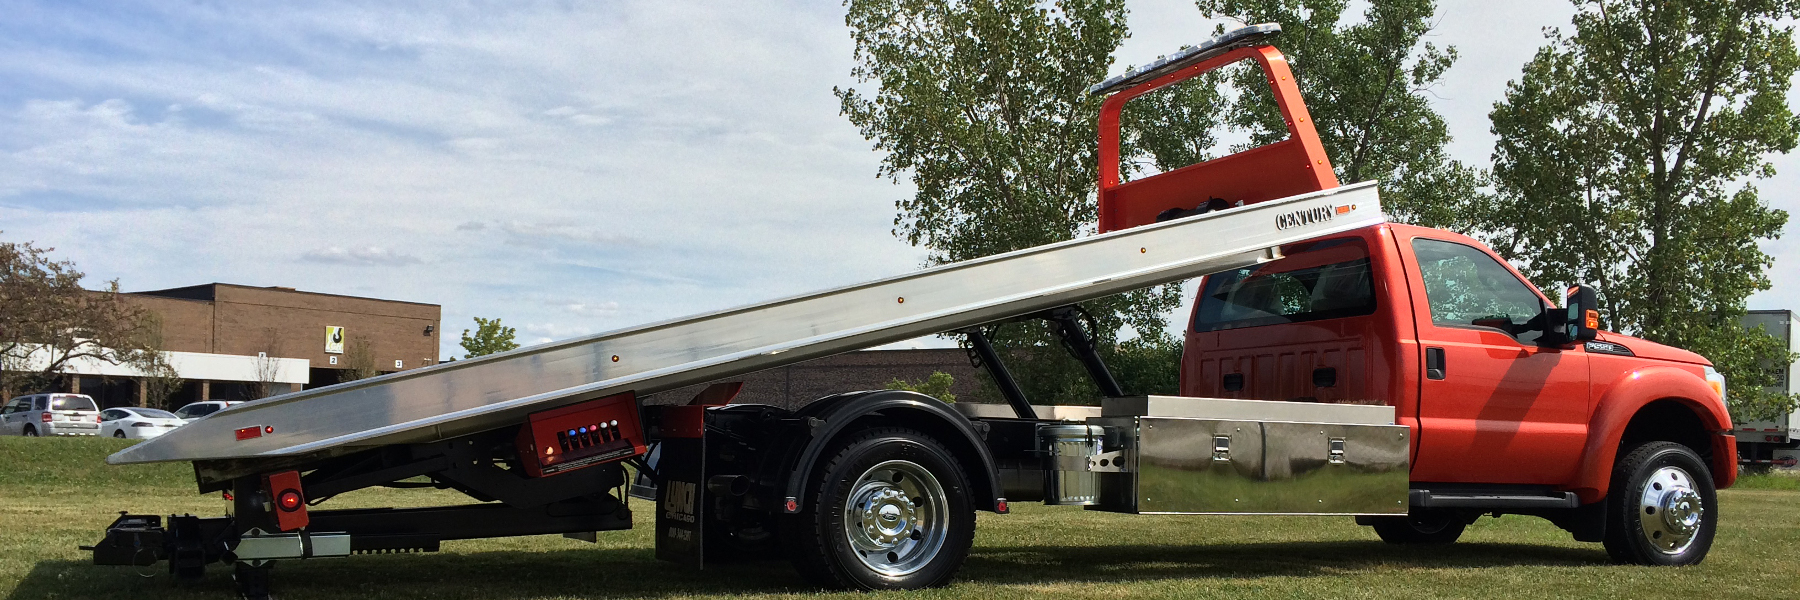 Carrier Tow Truck